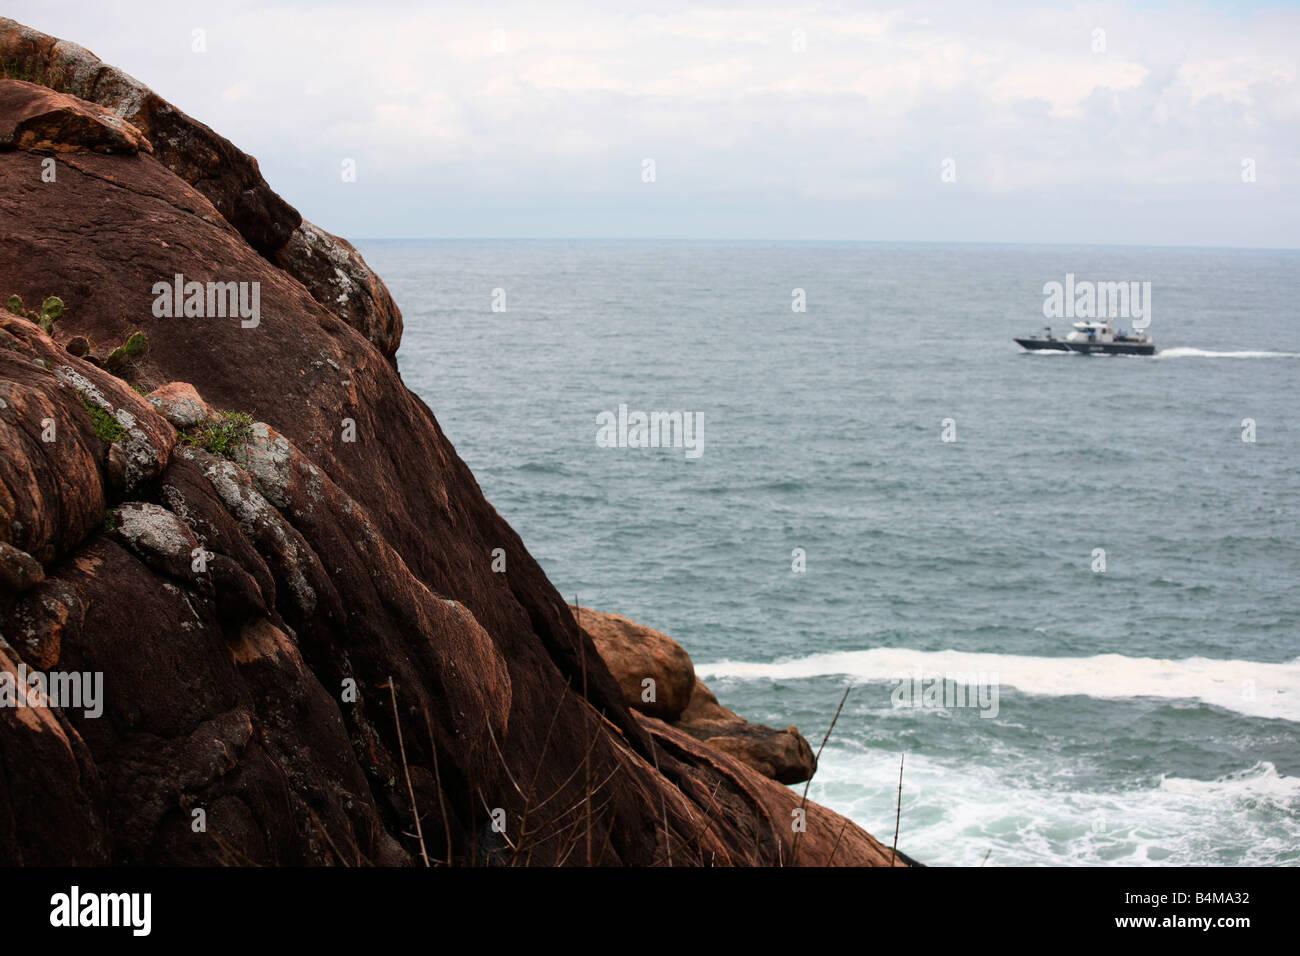 A view of a coastal area in Kerala, India Stock Photo